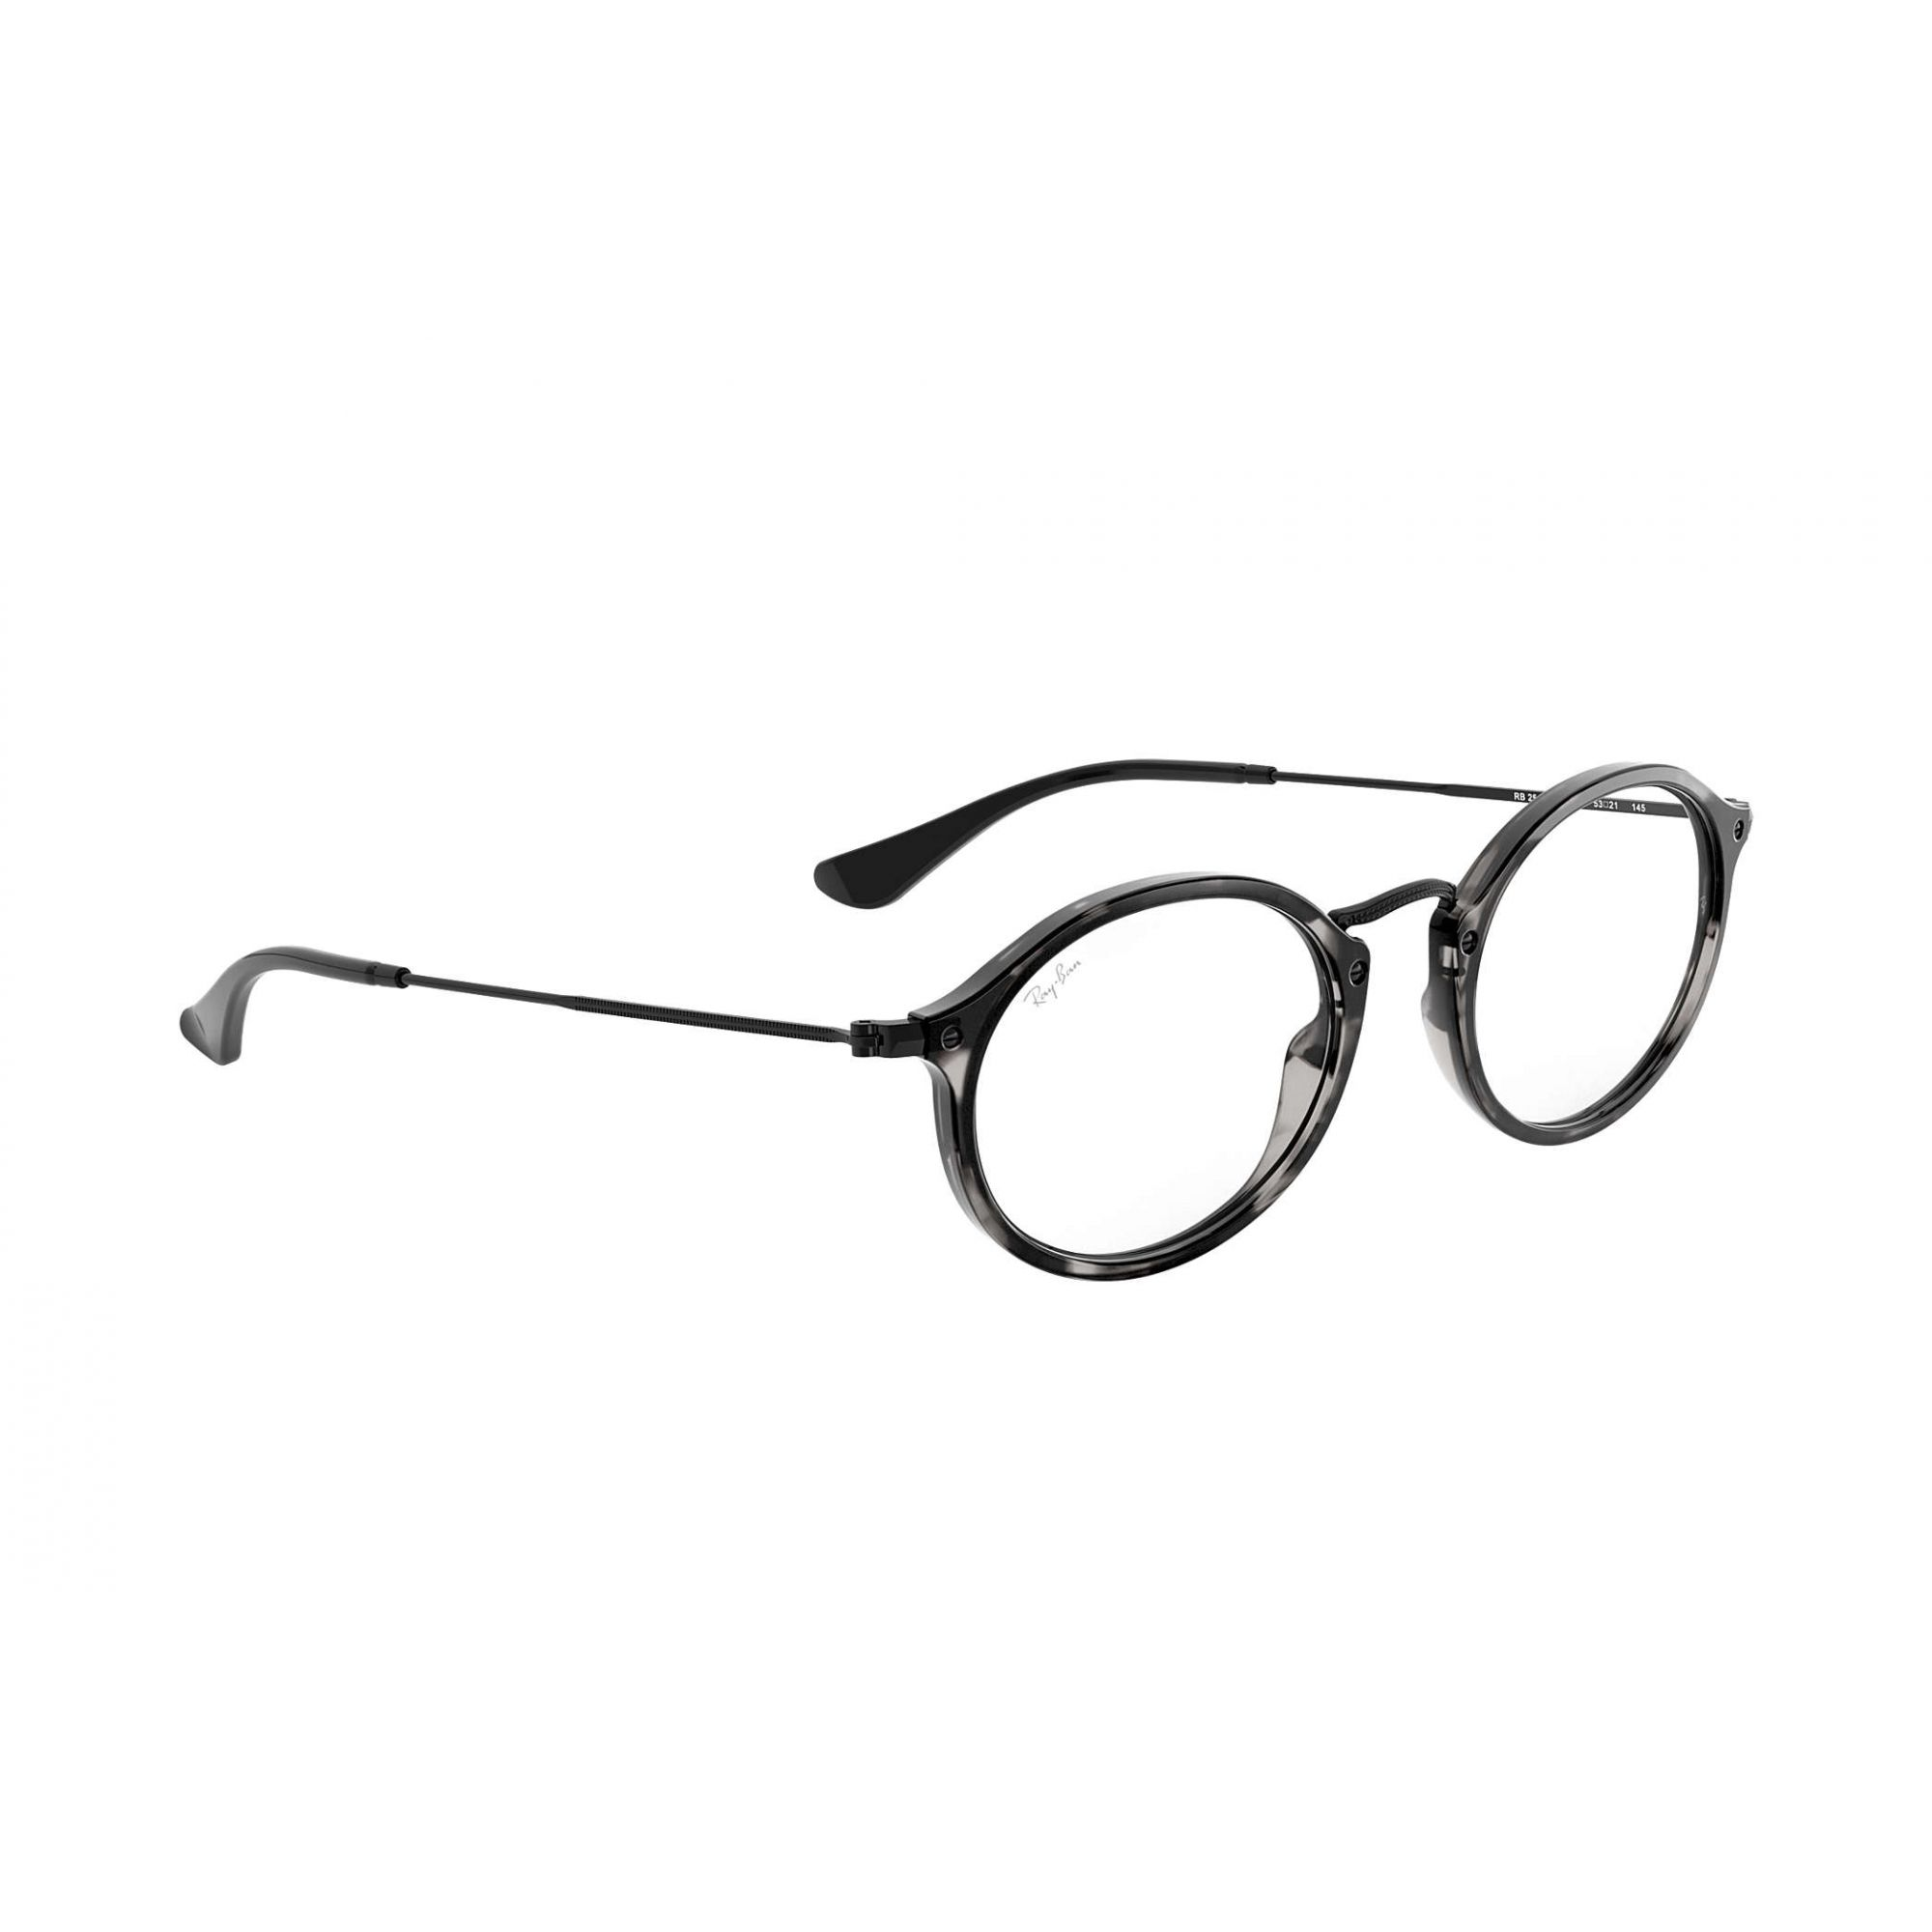 Ray Ban - RB2547V 5833 - Óculos de grau